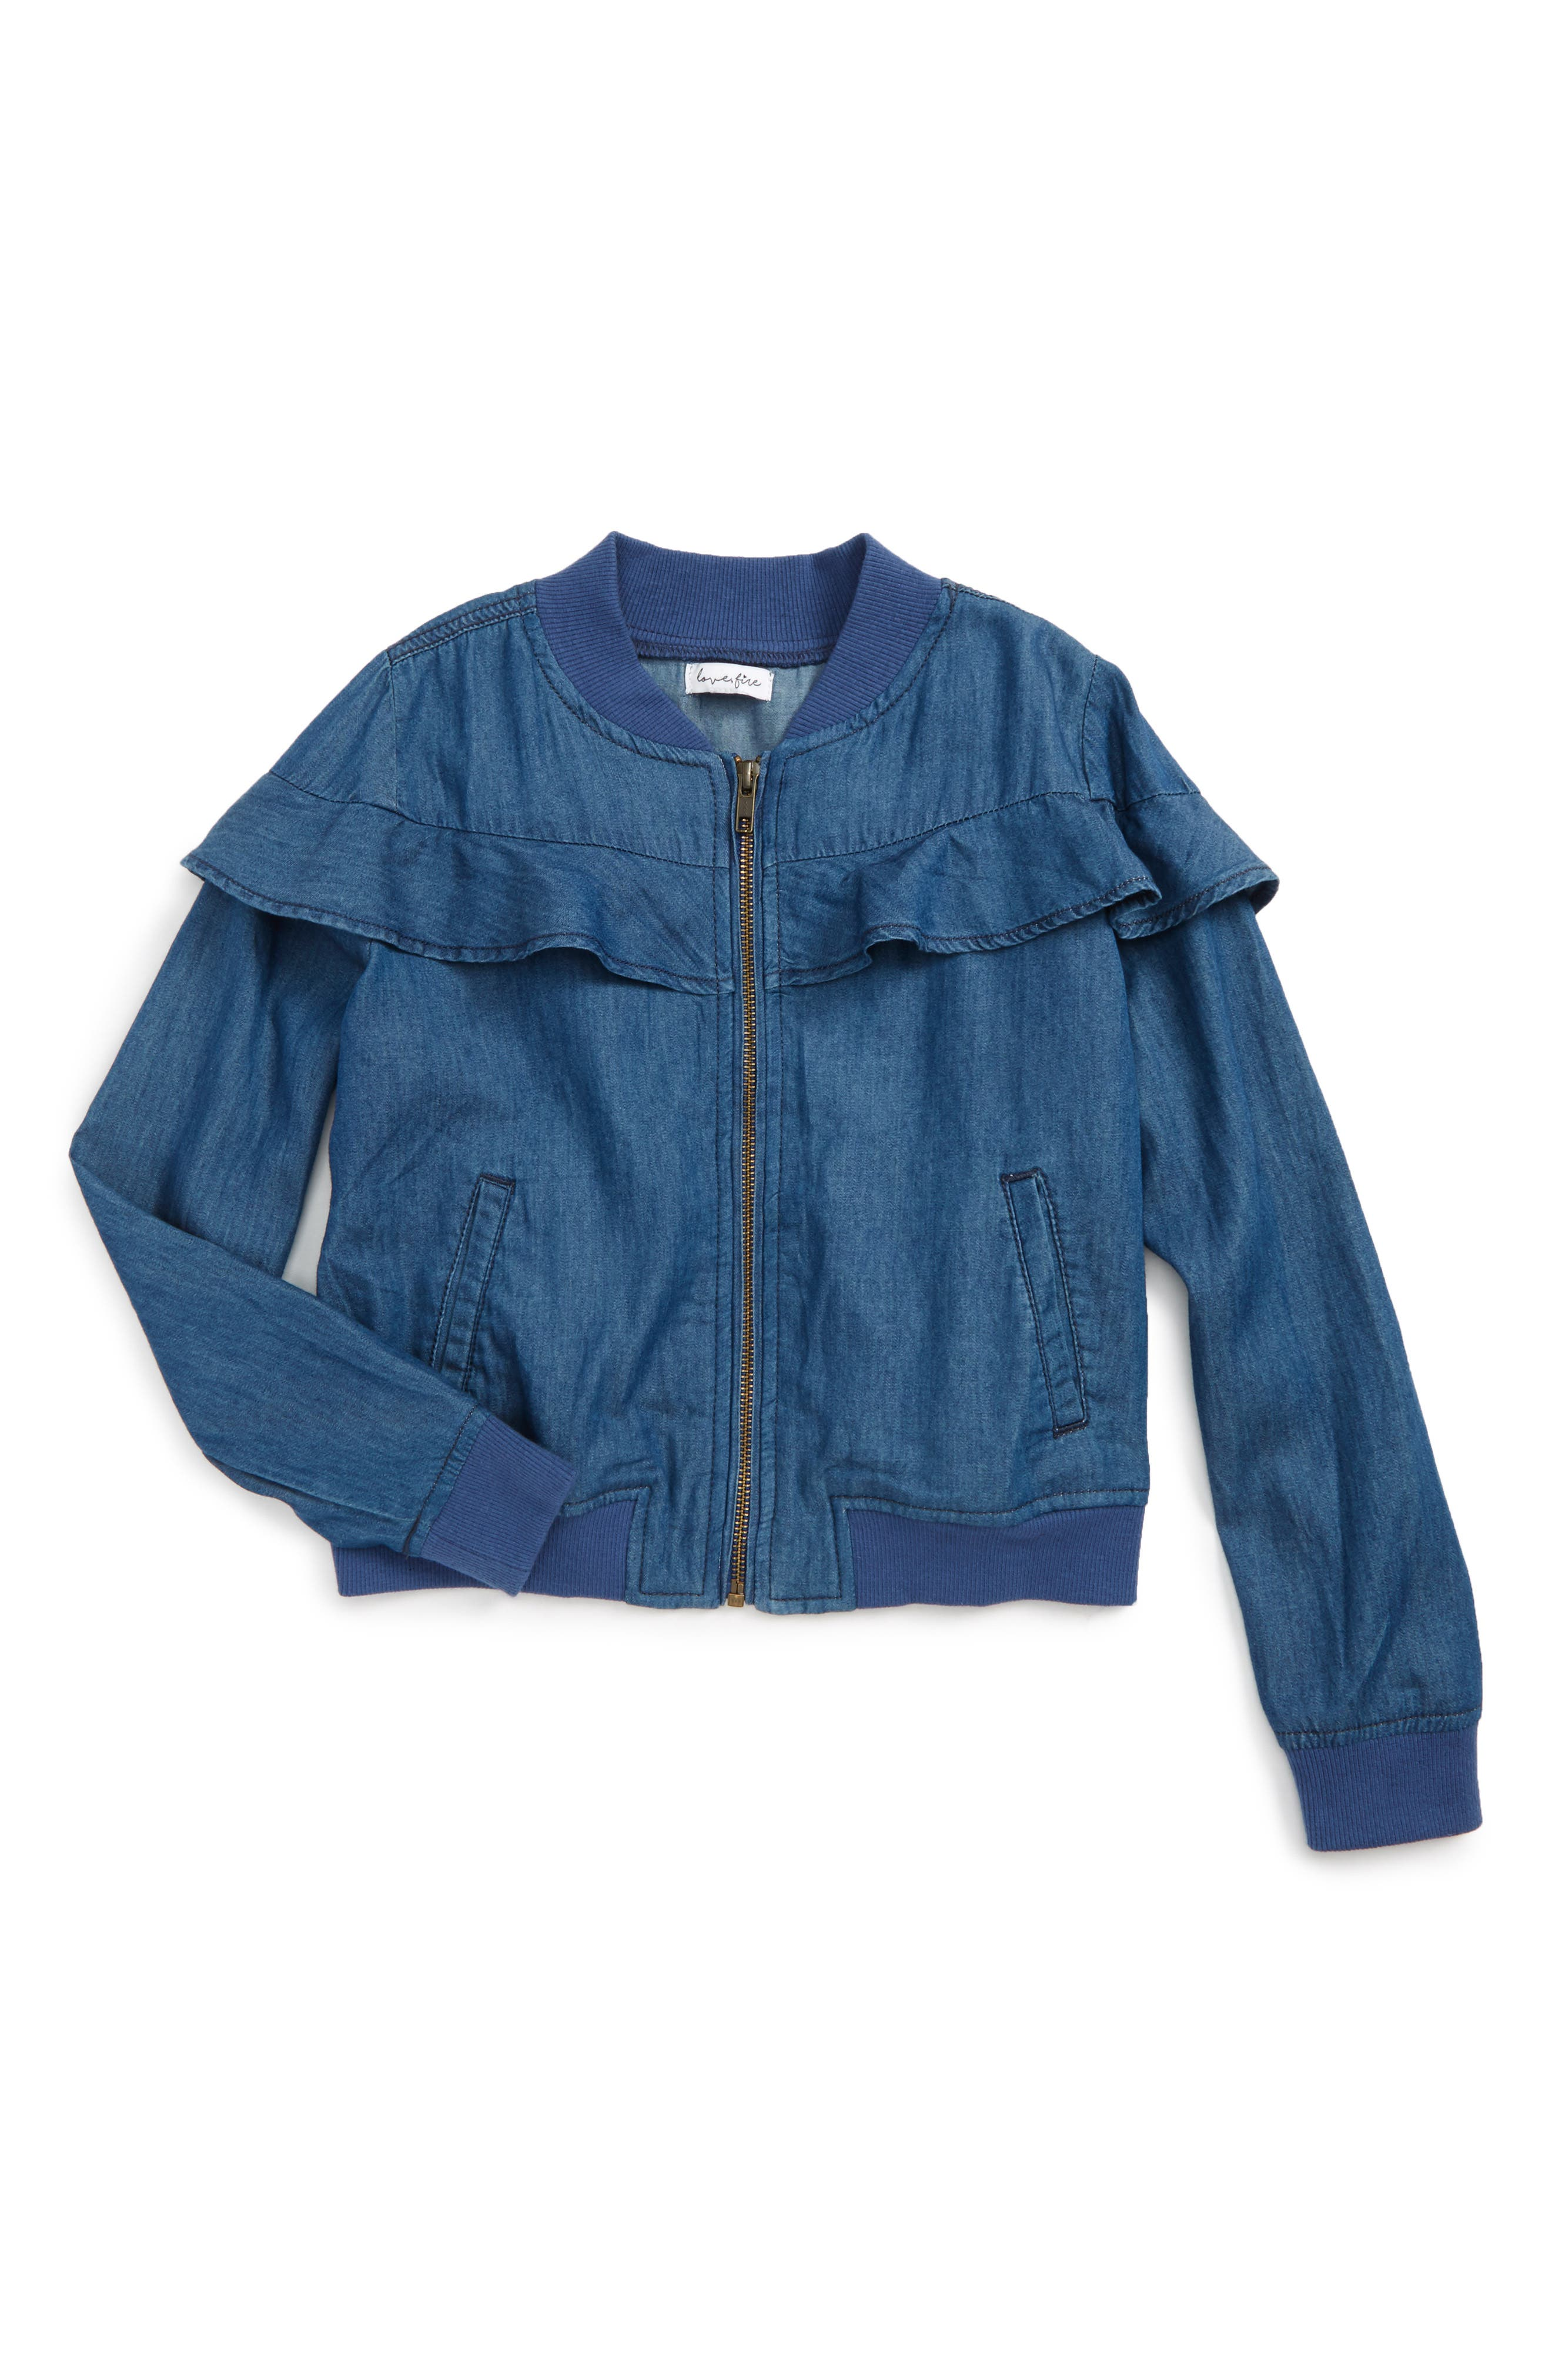 Alternate Image 1 Selected - Love, Fire Ruffle Denim Jacket (Big Girls)